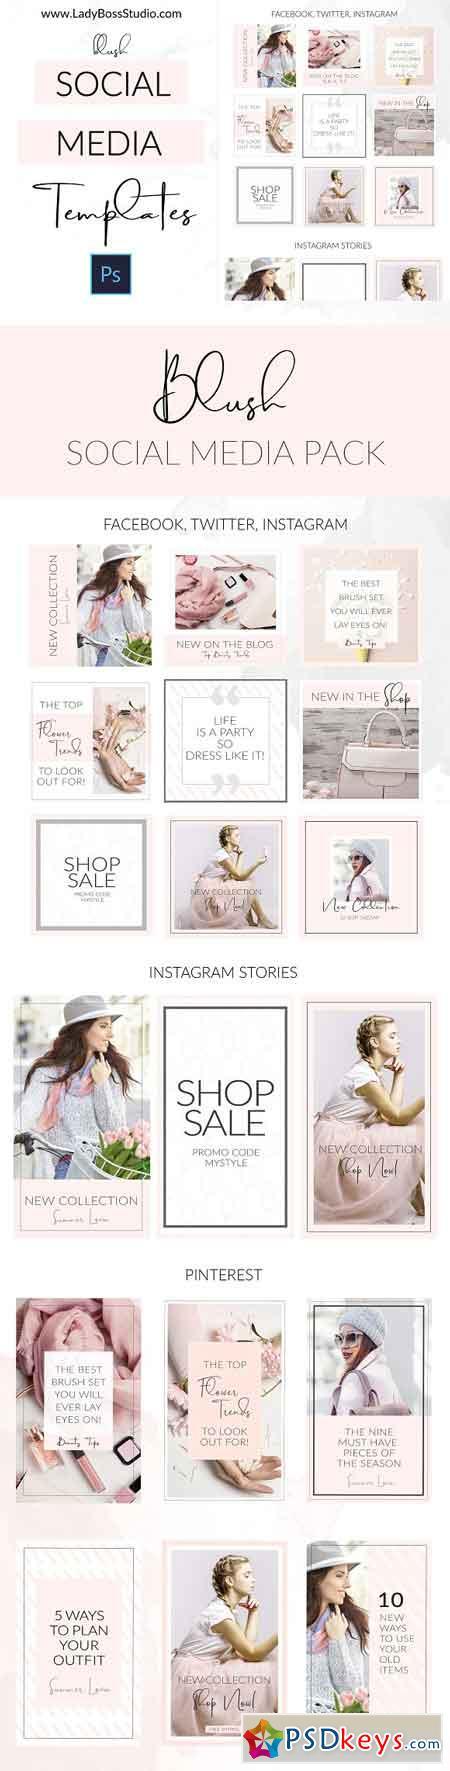 Social Media Templates + Pinterest 2963726